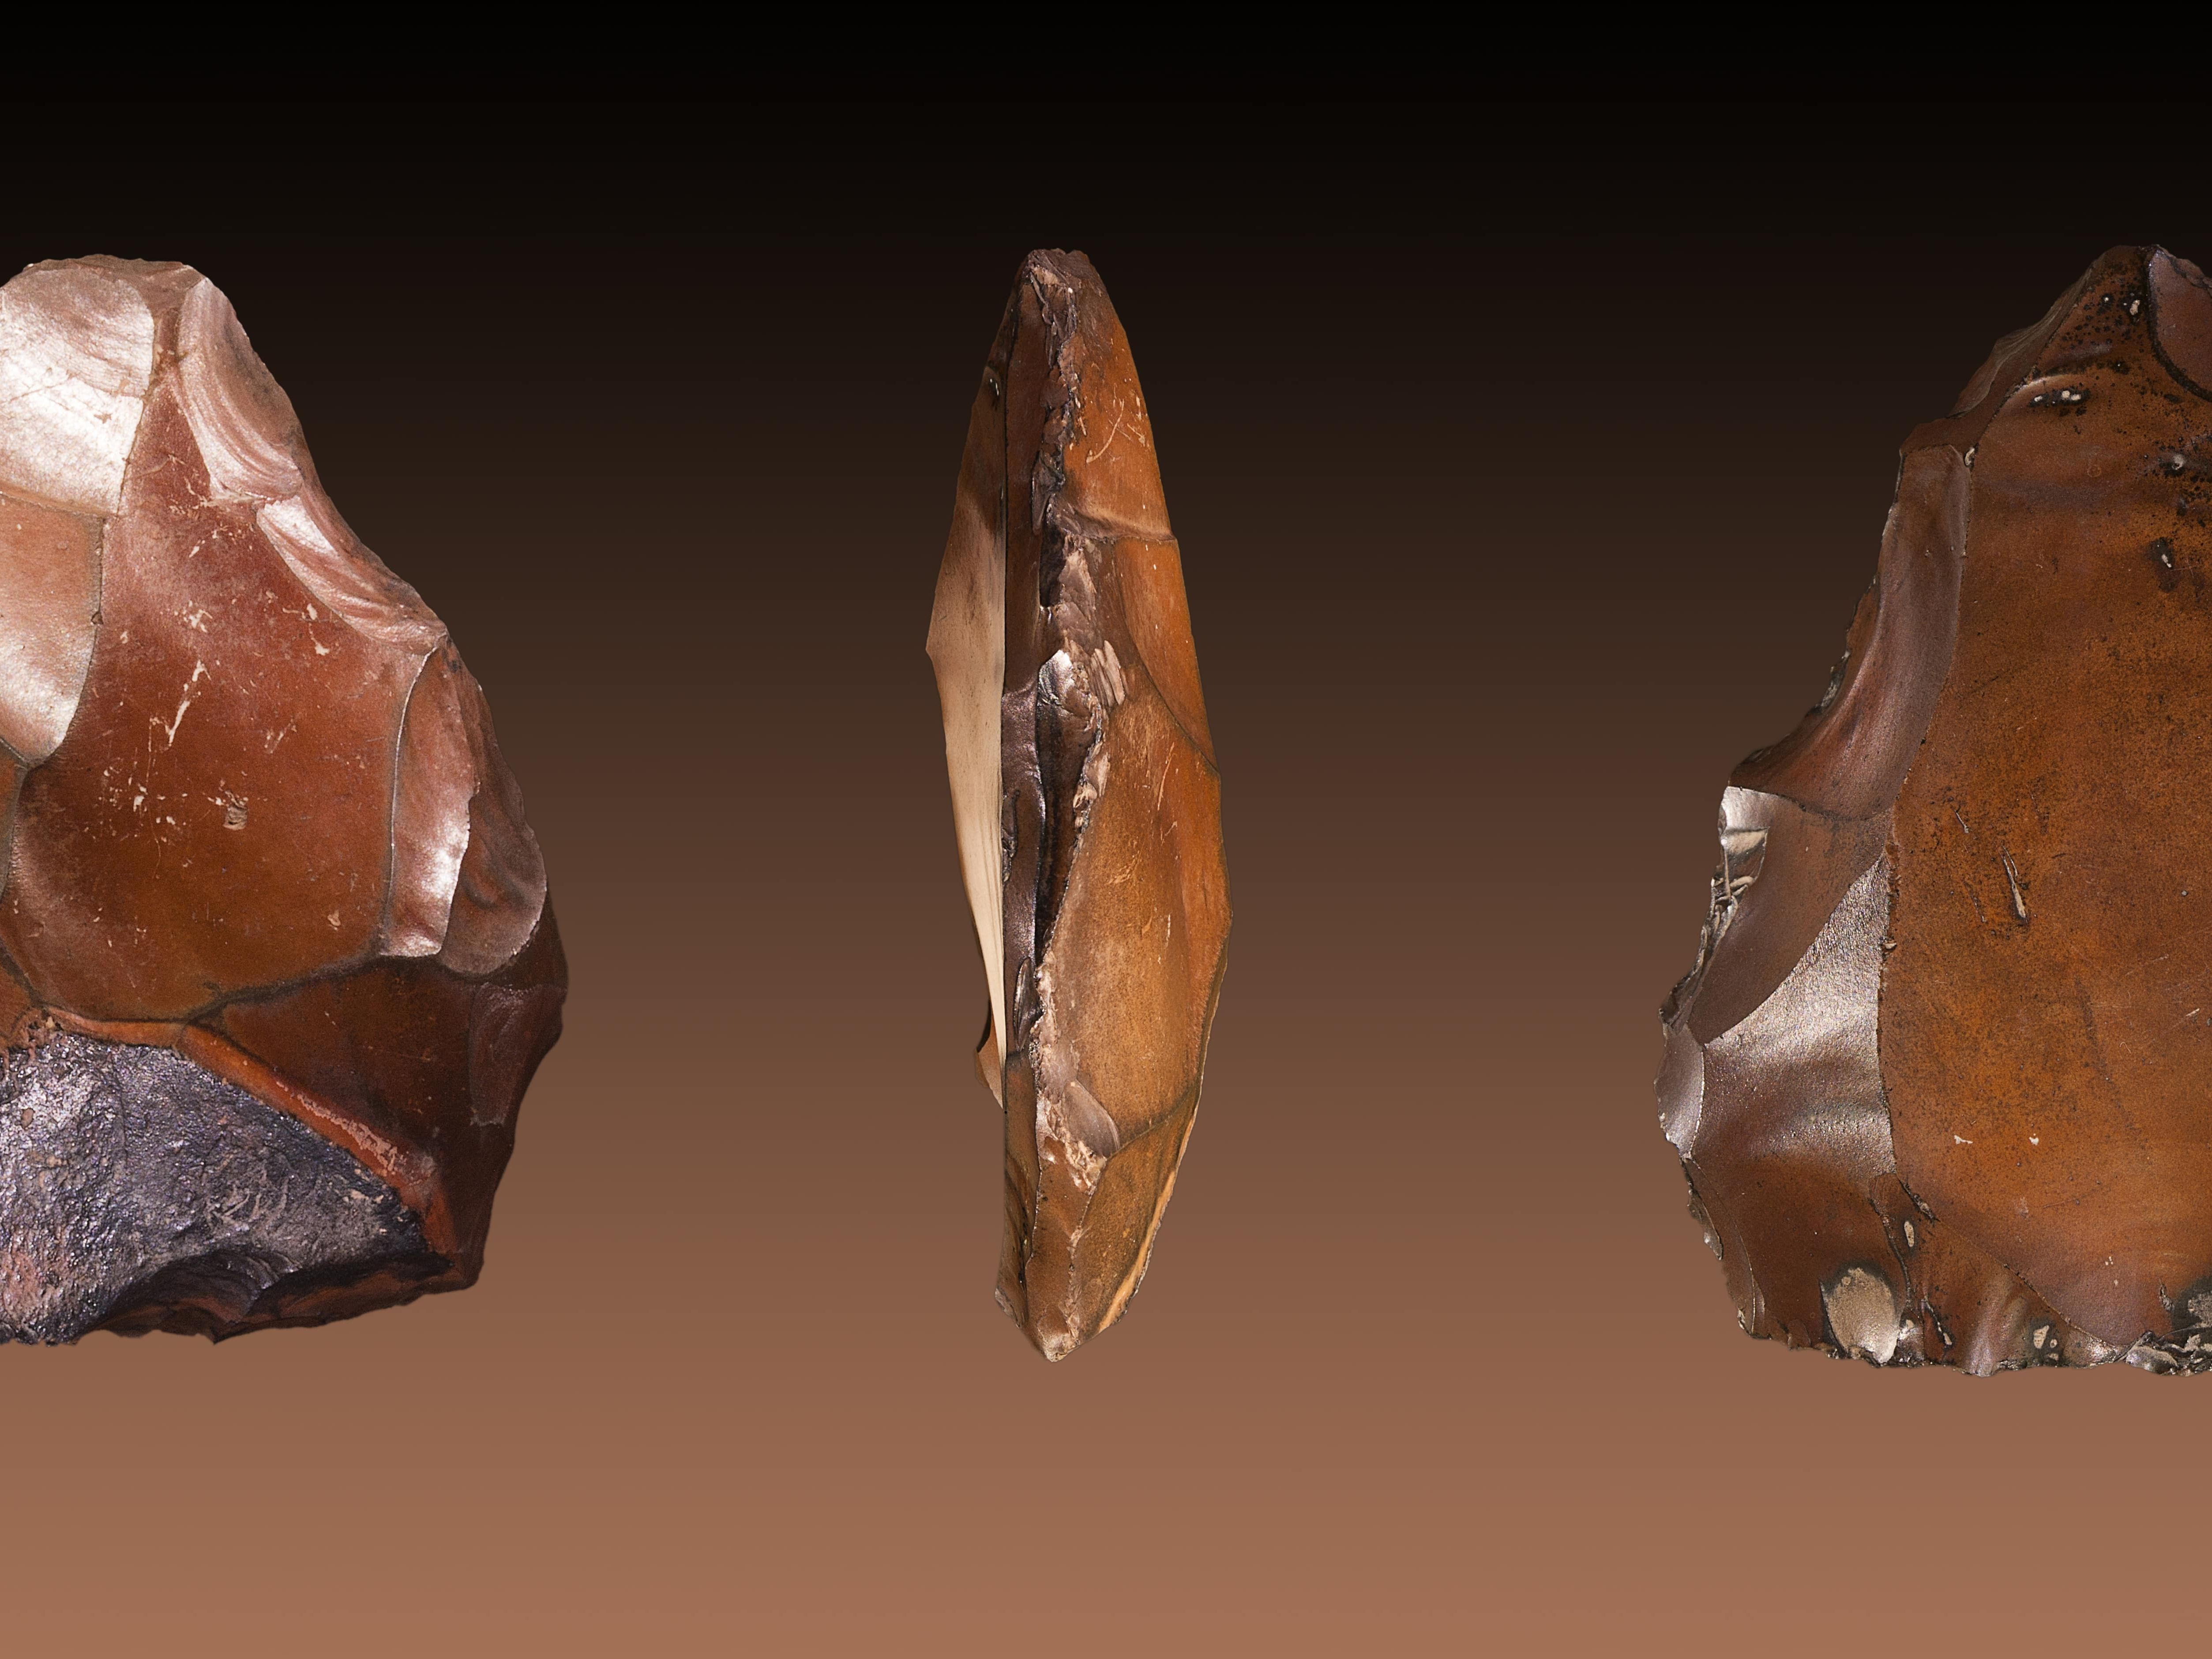 nucleus-levallois-paleolithique-moyen-vallee-des-rois-egypte